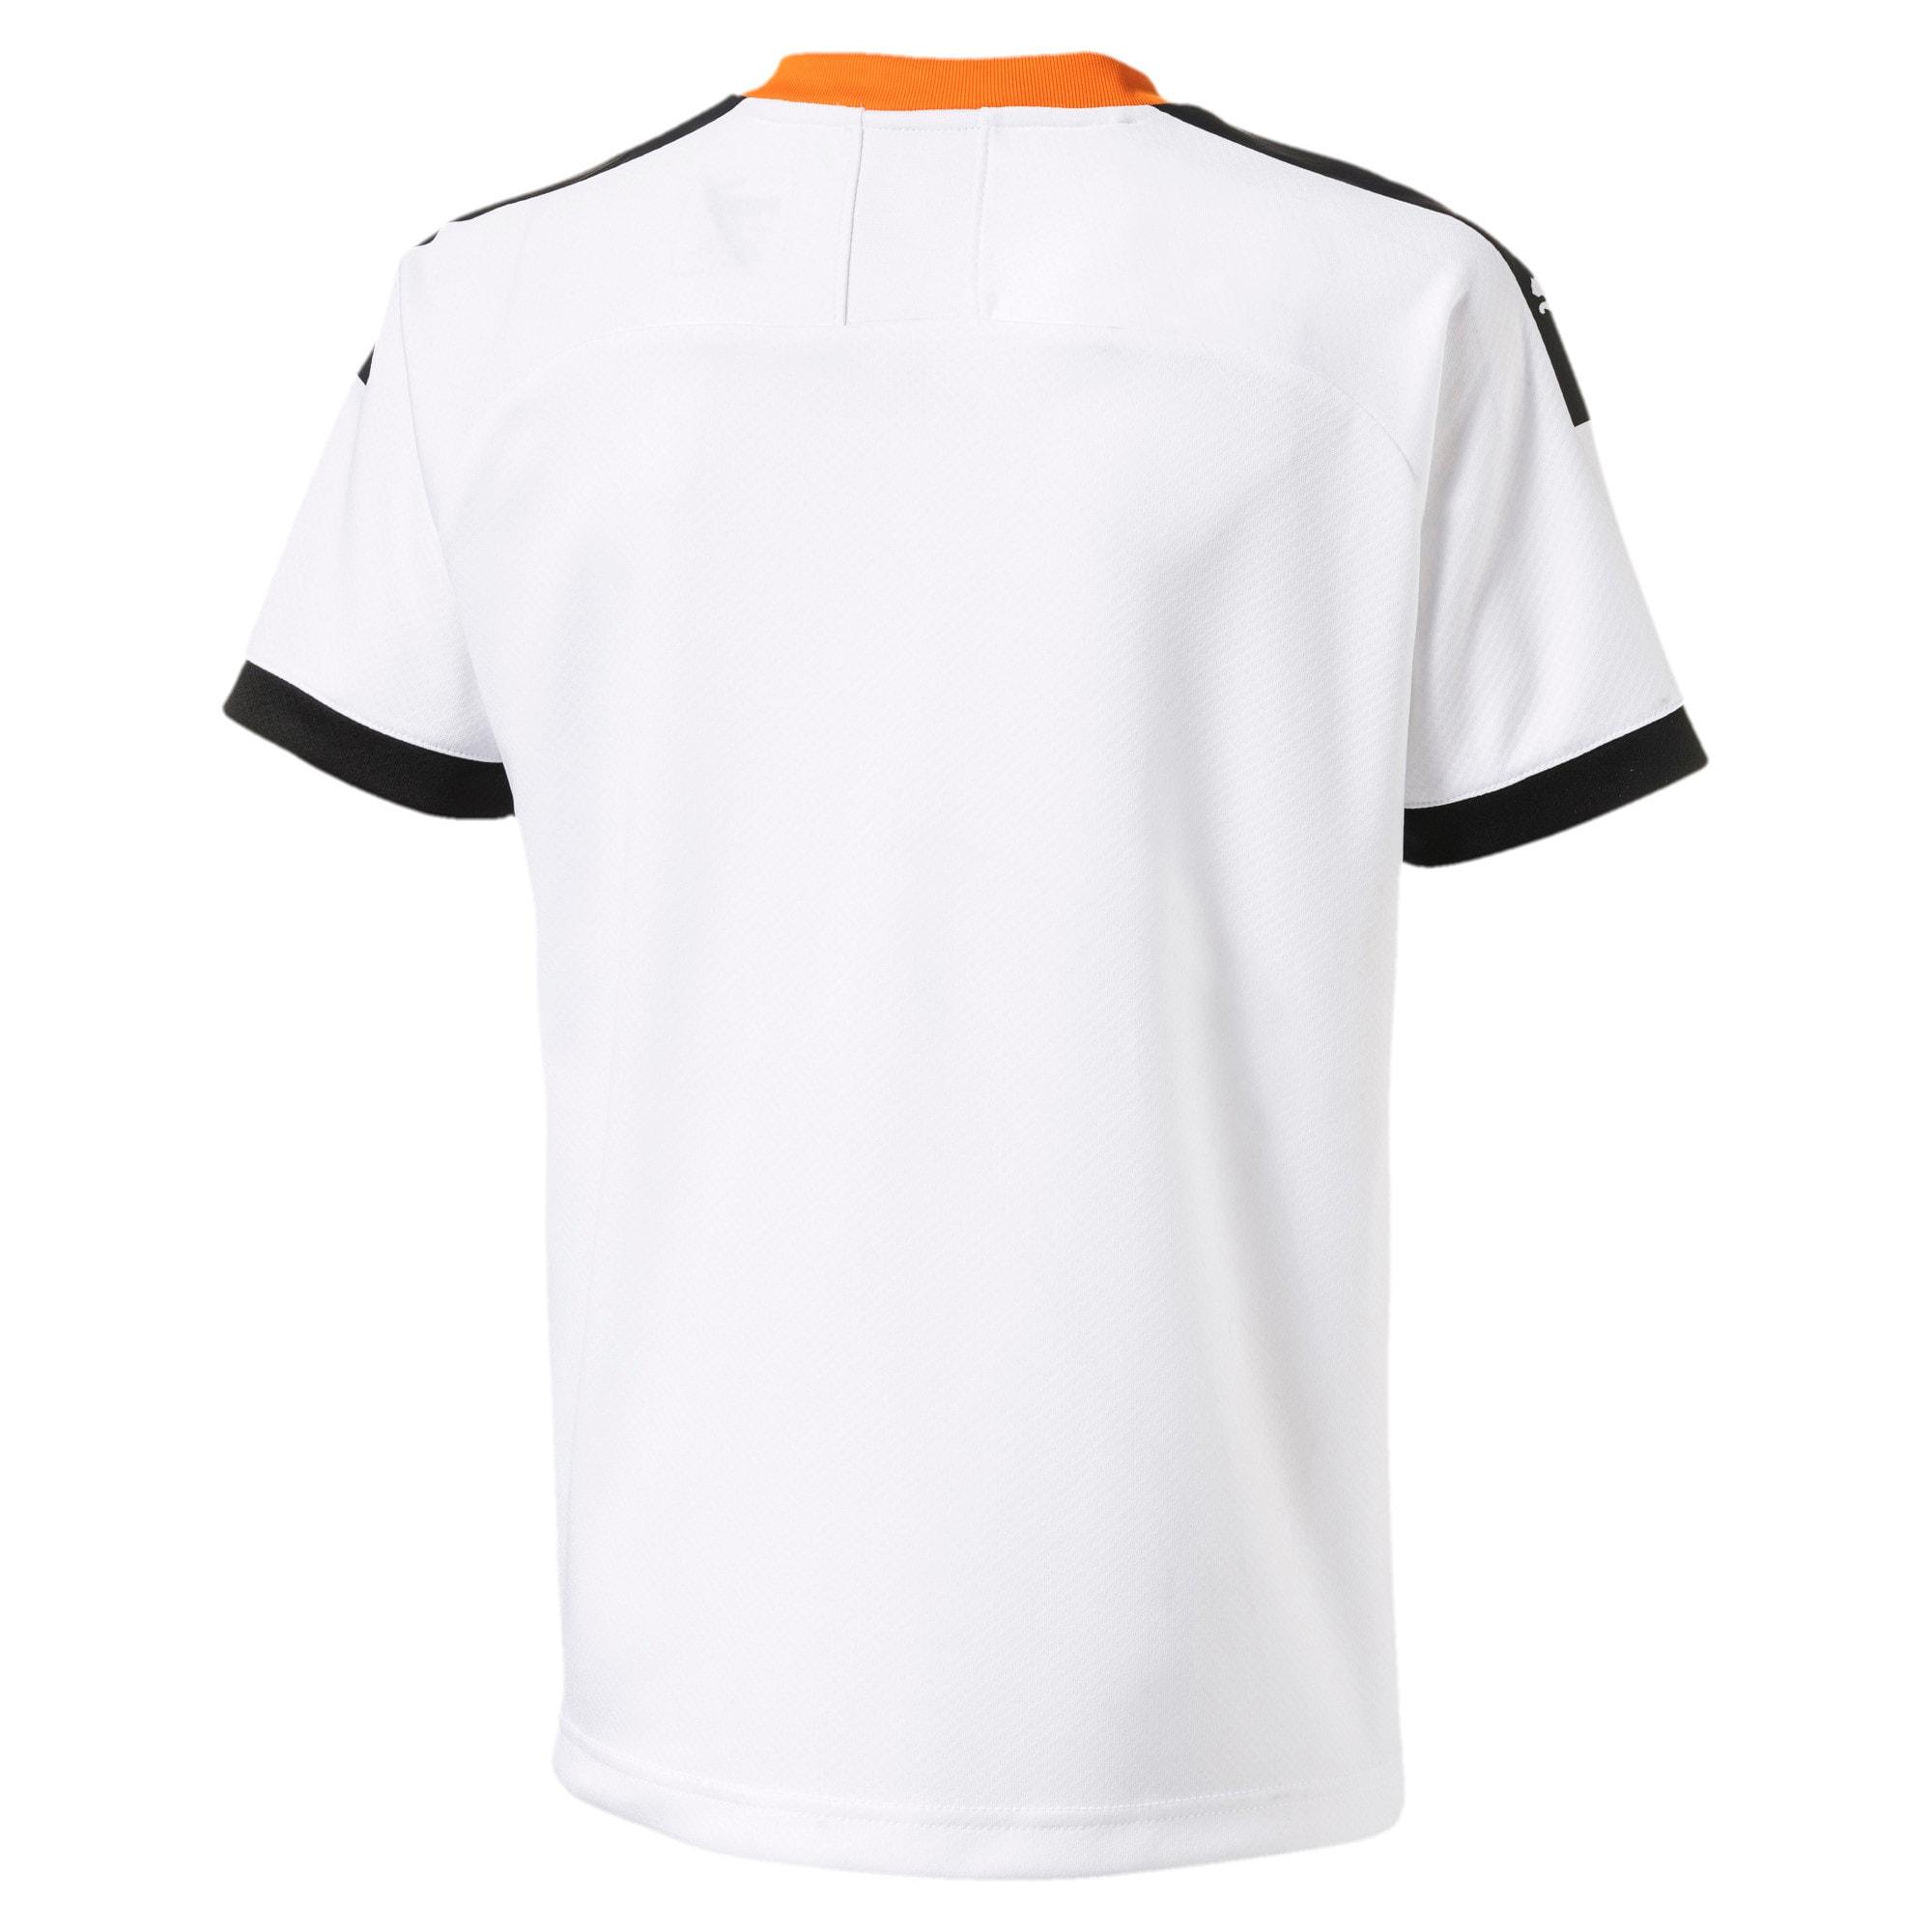 Thumbnail 2 of Valencia CF Home Replica Kids' Jersey, White- Black-Vibrant Orange, medium